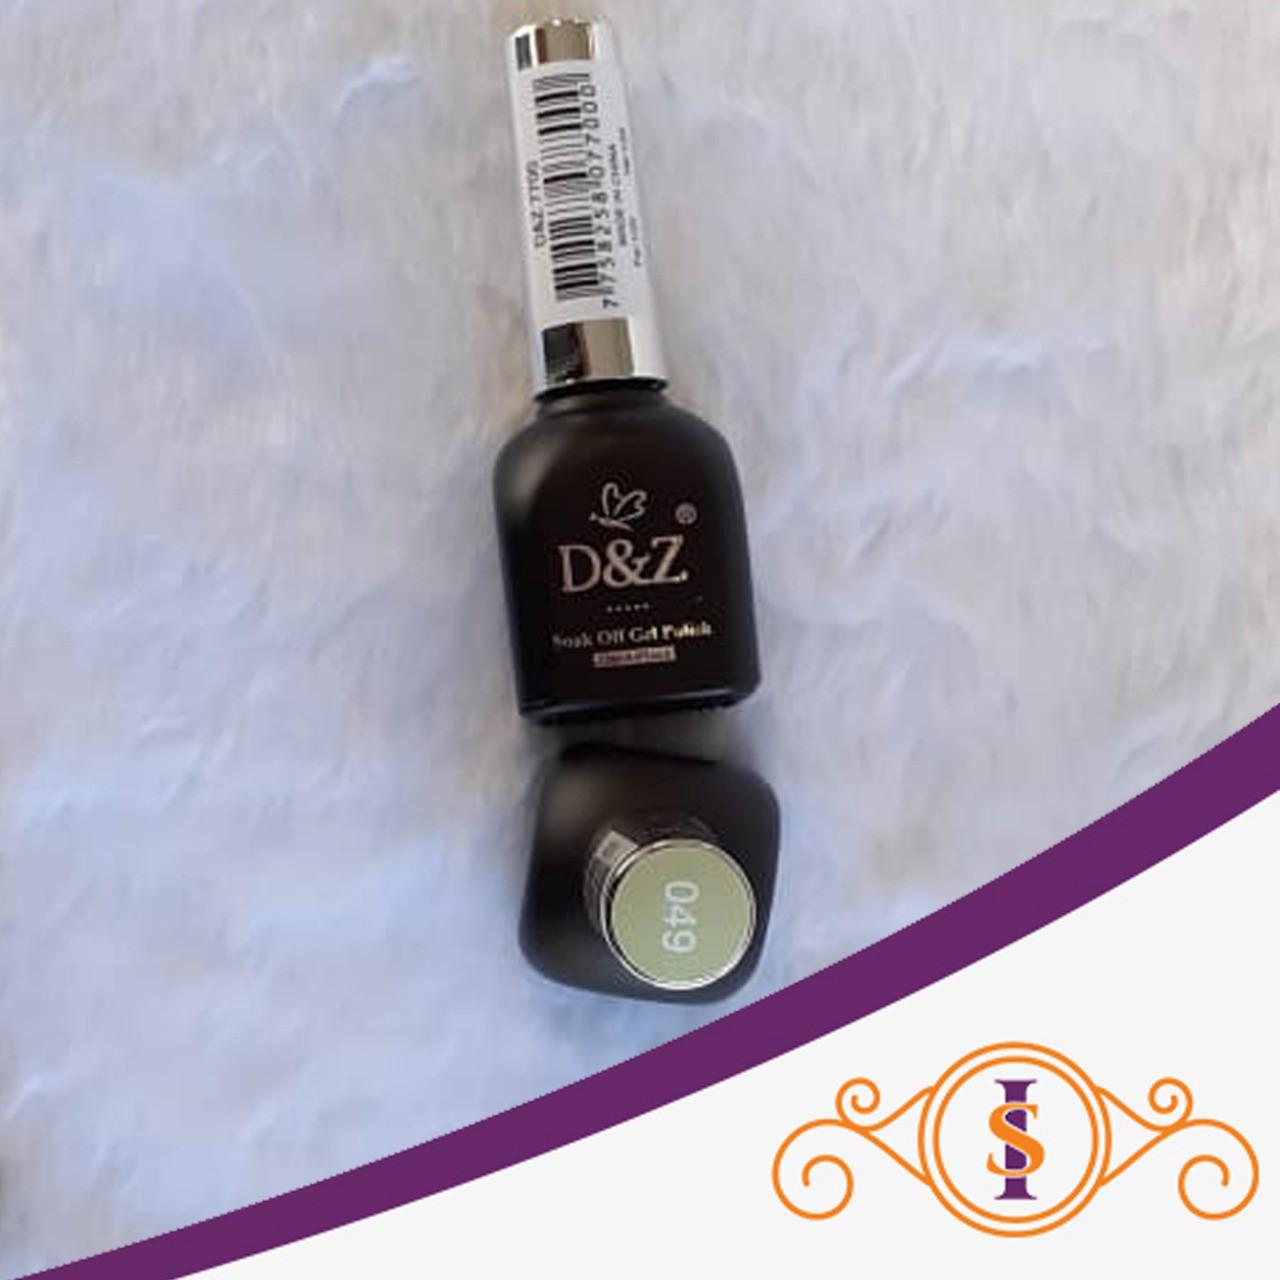 Esmalte em Gel D&Z 12ml - Soak Off Gel Polish - Cor 049